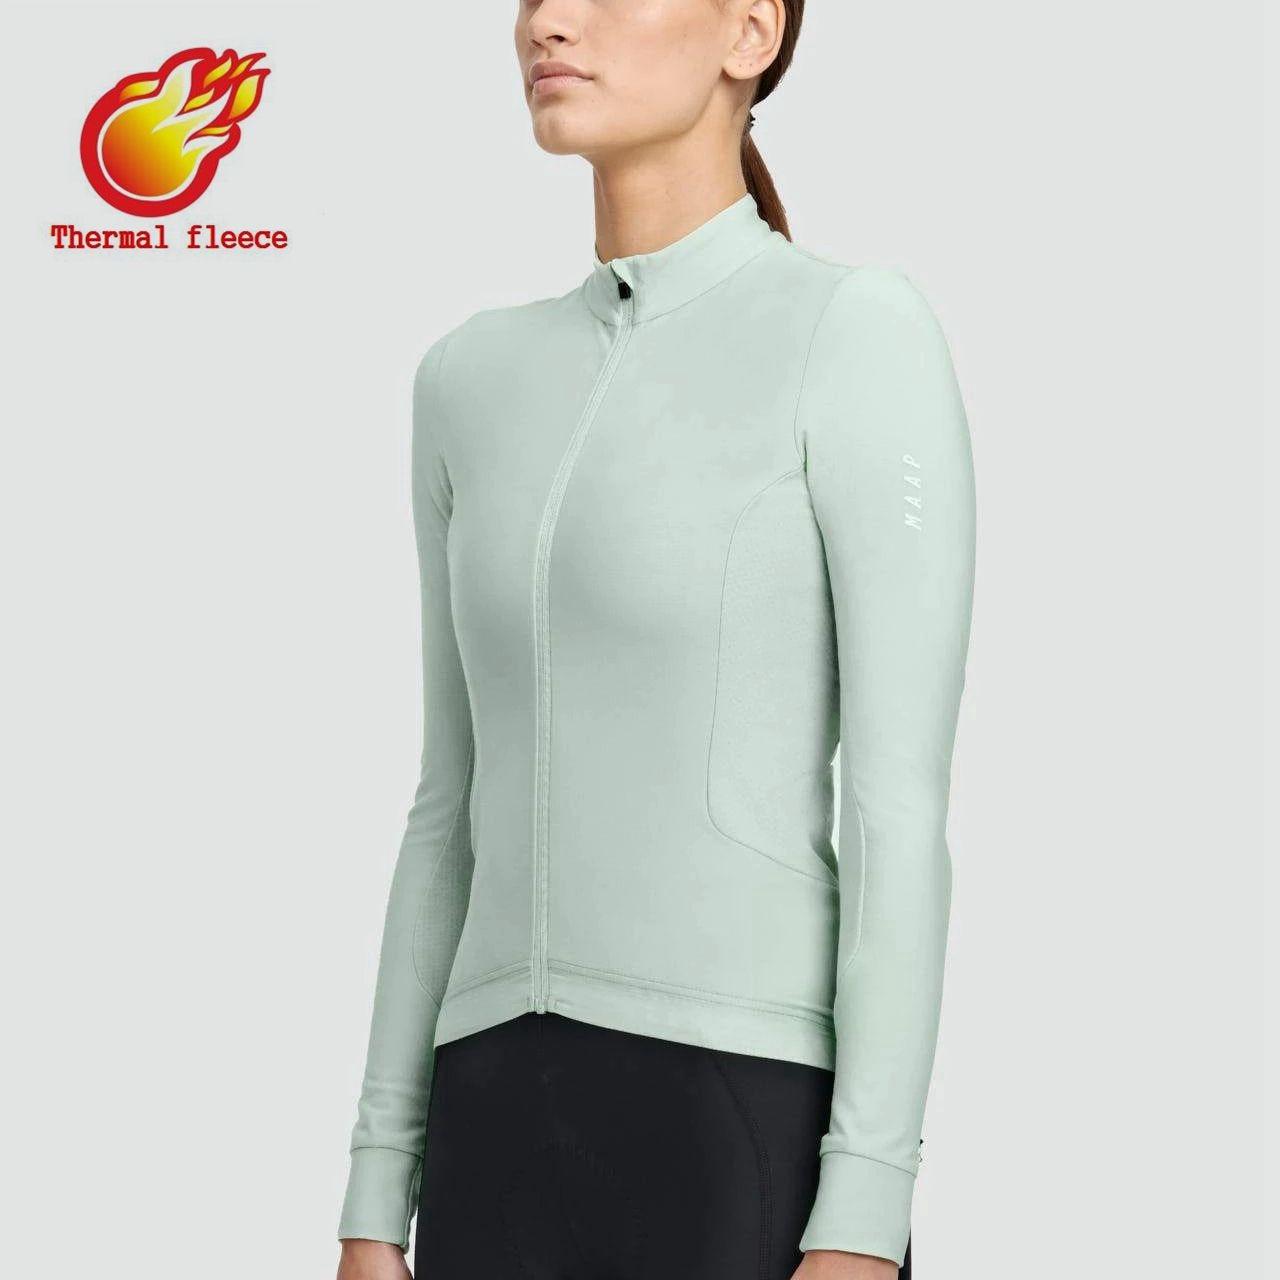 Maap-jersey de ciclismo de manga larga para mujer, ropa de ciclismo de montaña, camiseta de bicicleta de carretera, Maillot de manga larga